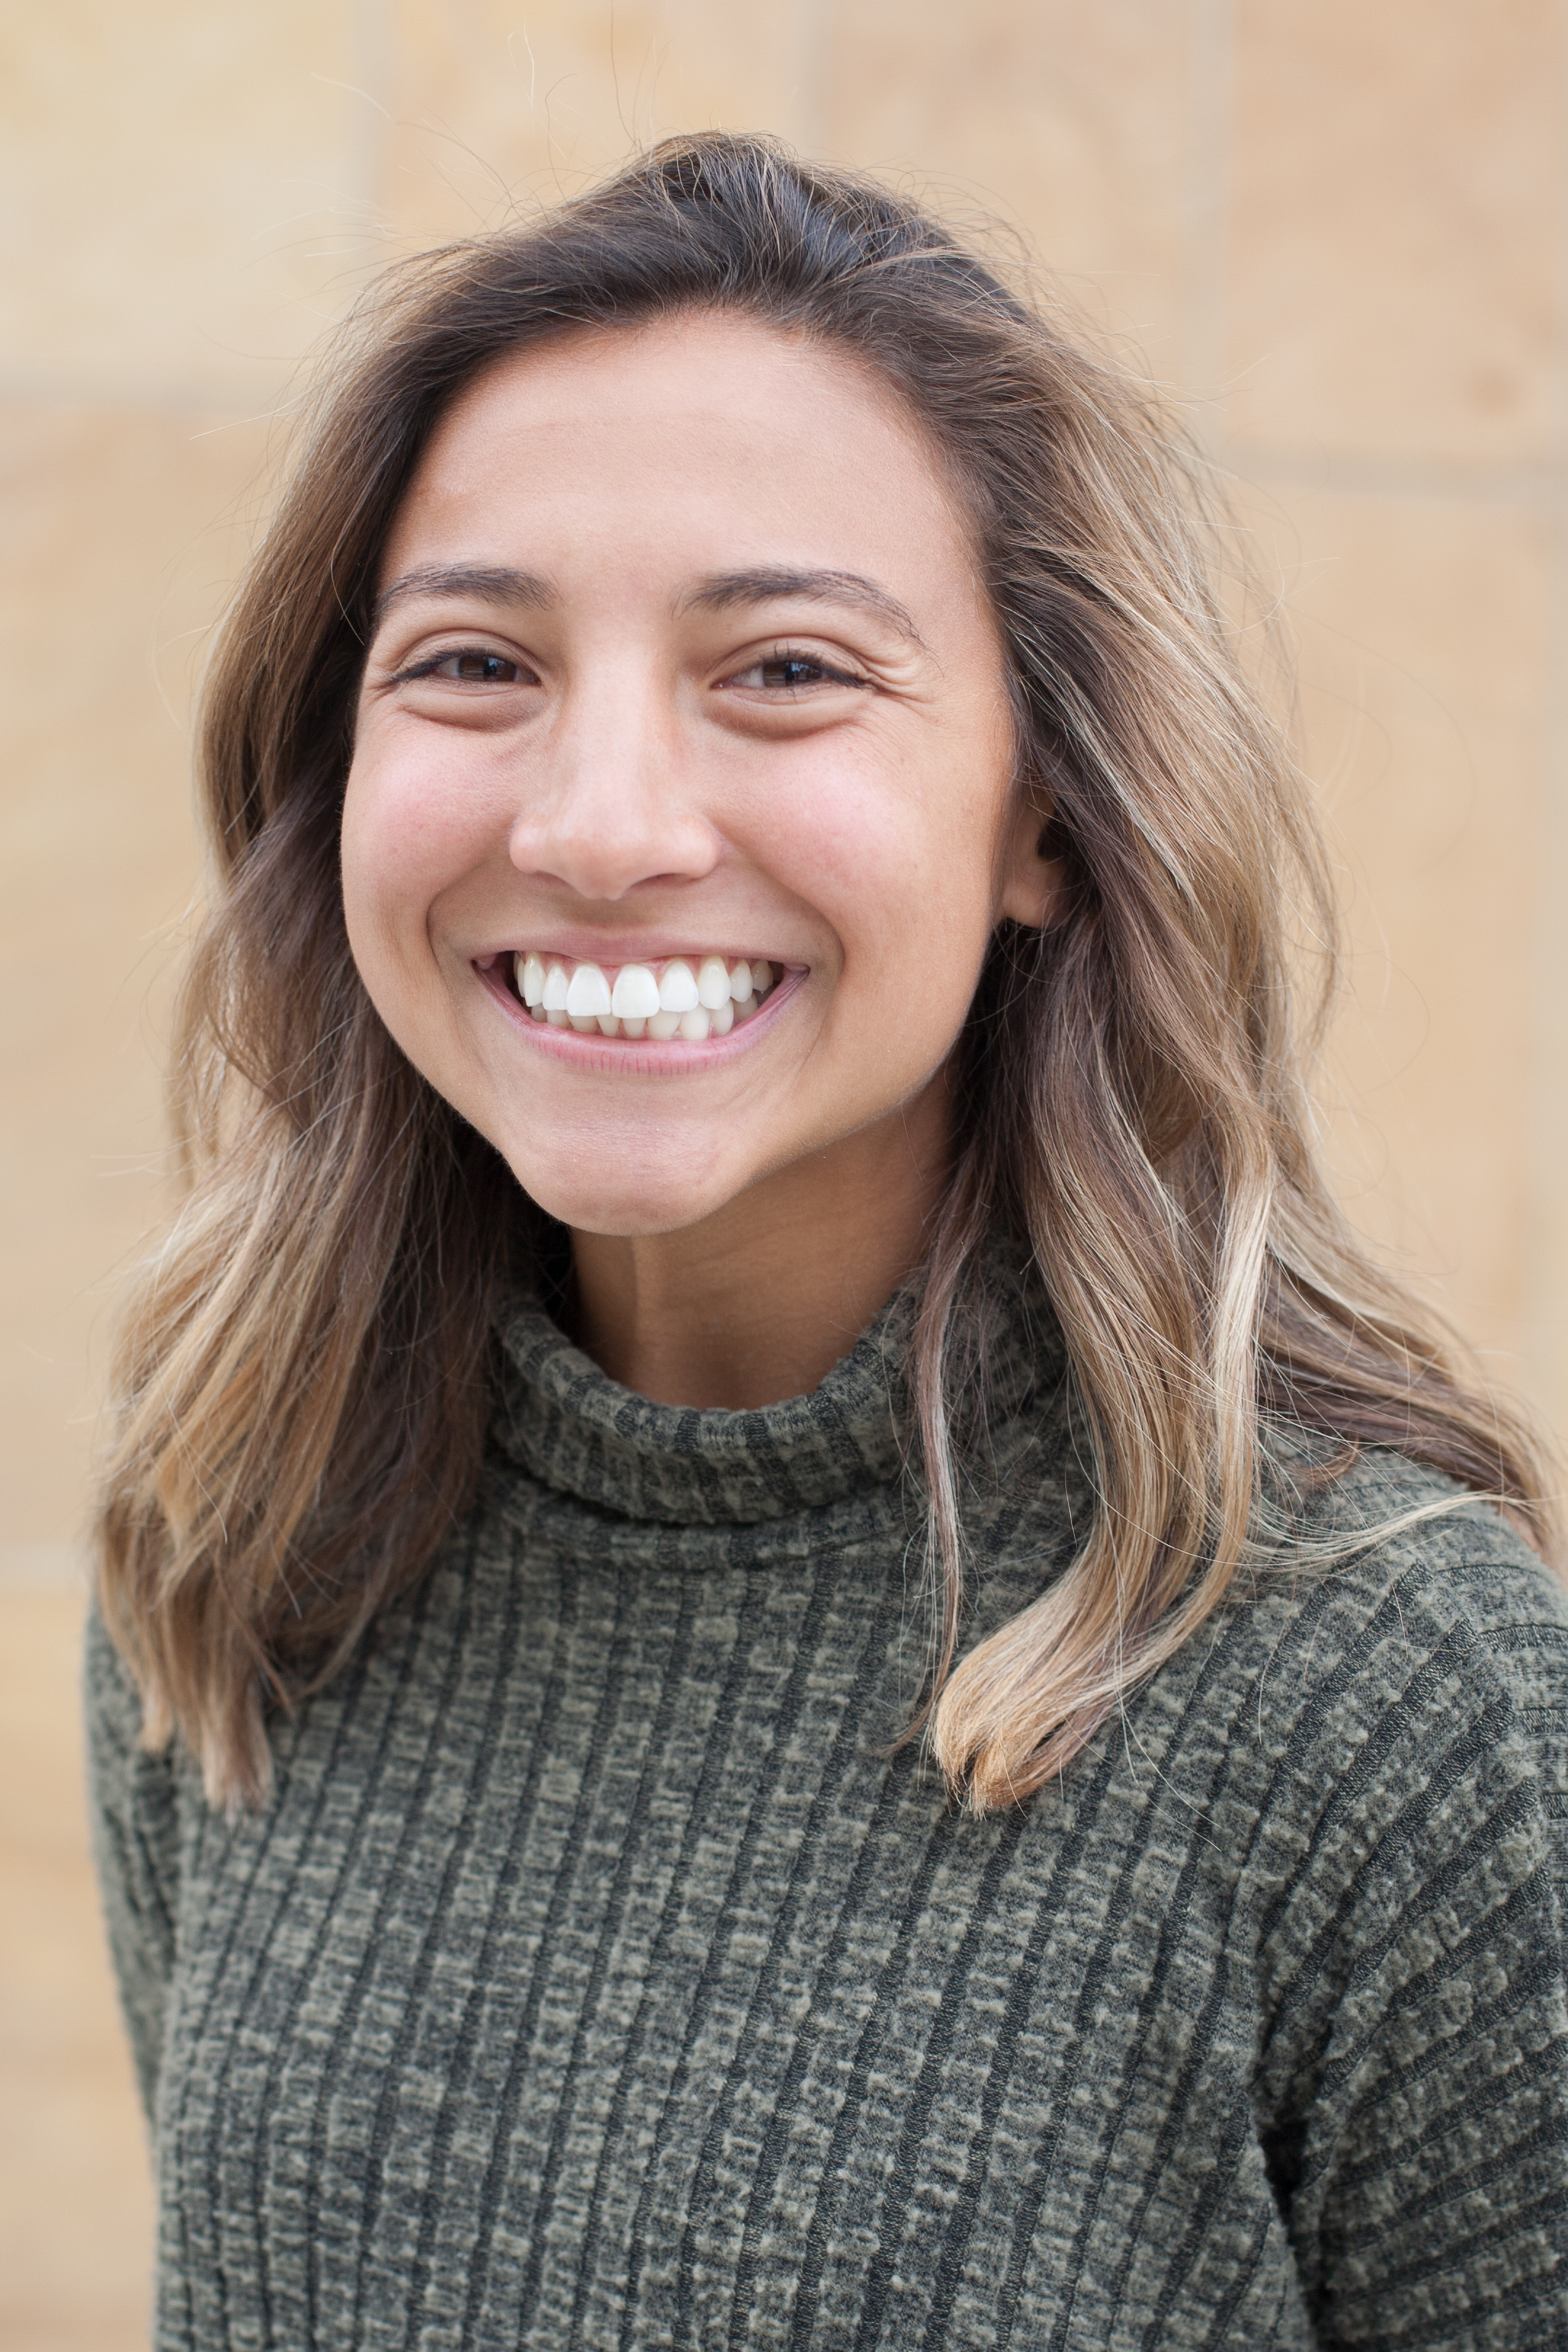 Nicole Trejo-Valli, Associate & Online Editor